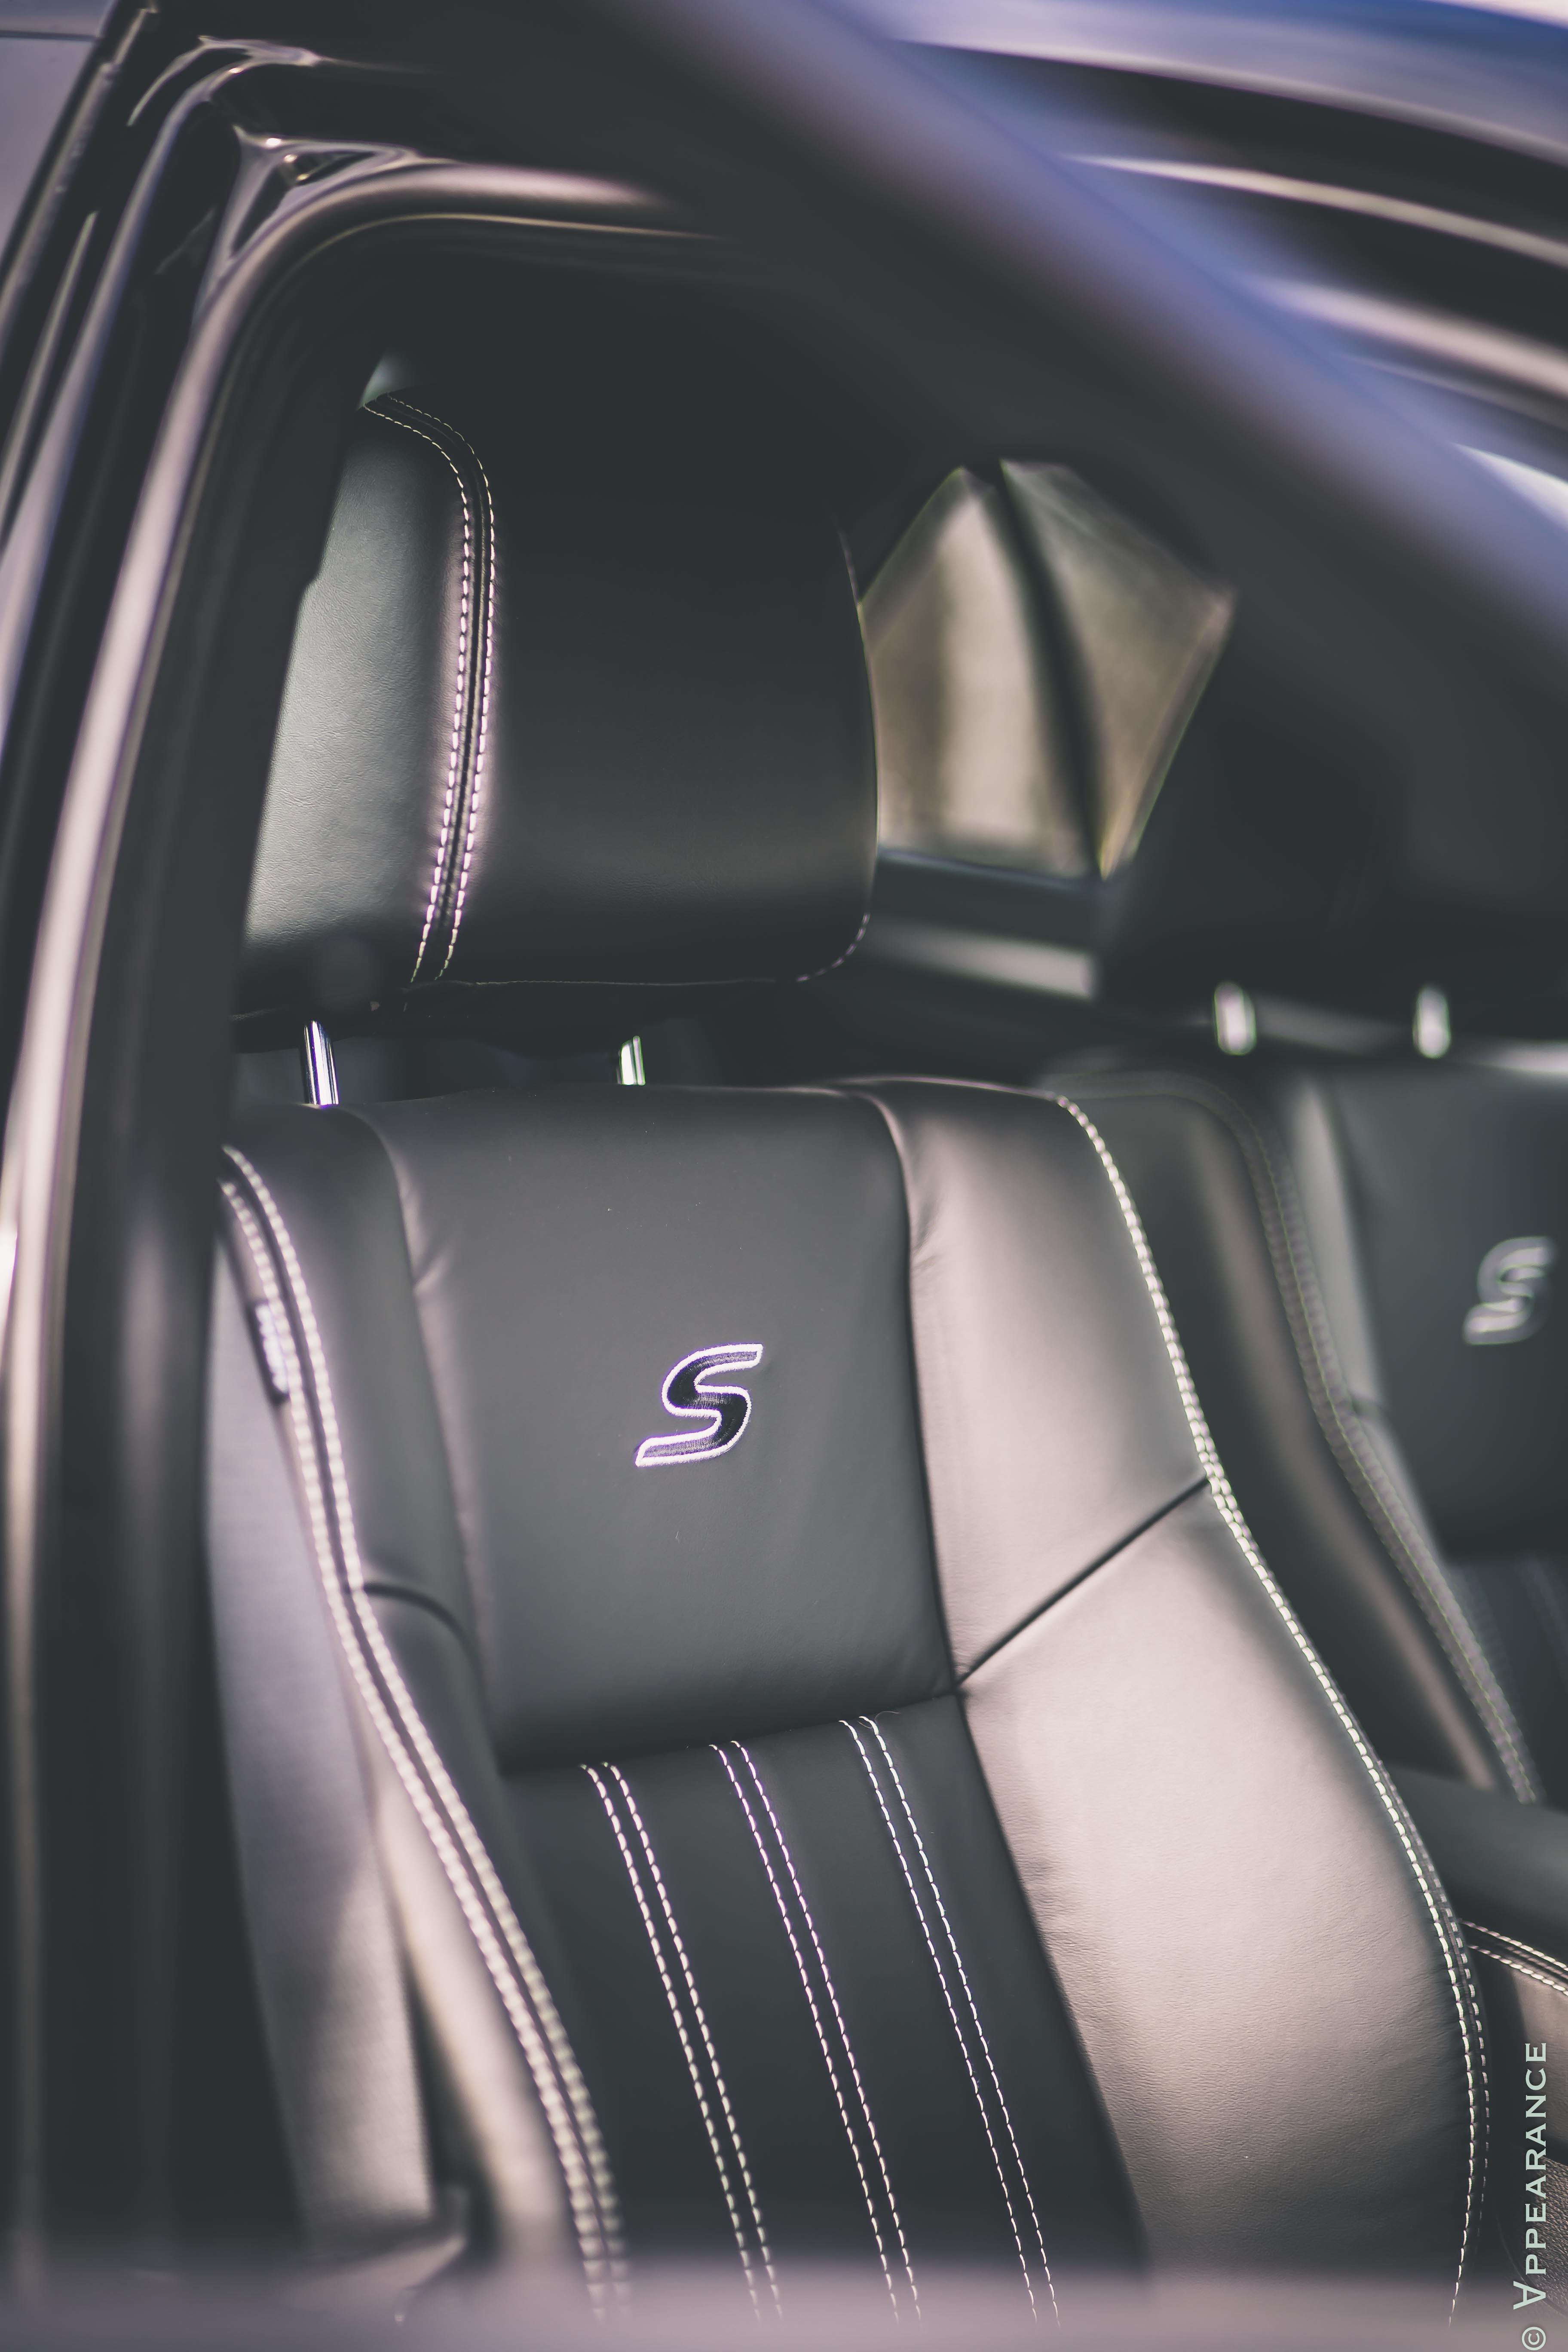 2016 Chrysler 300S Seats